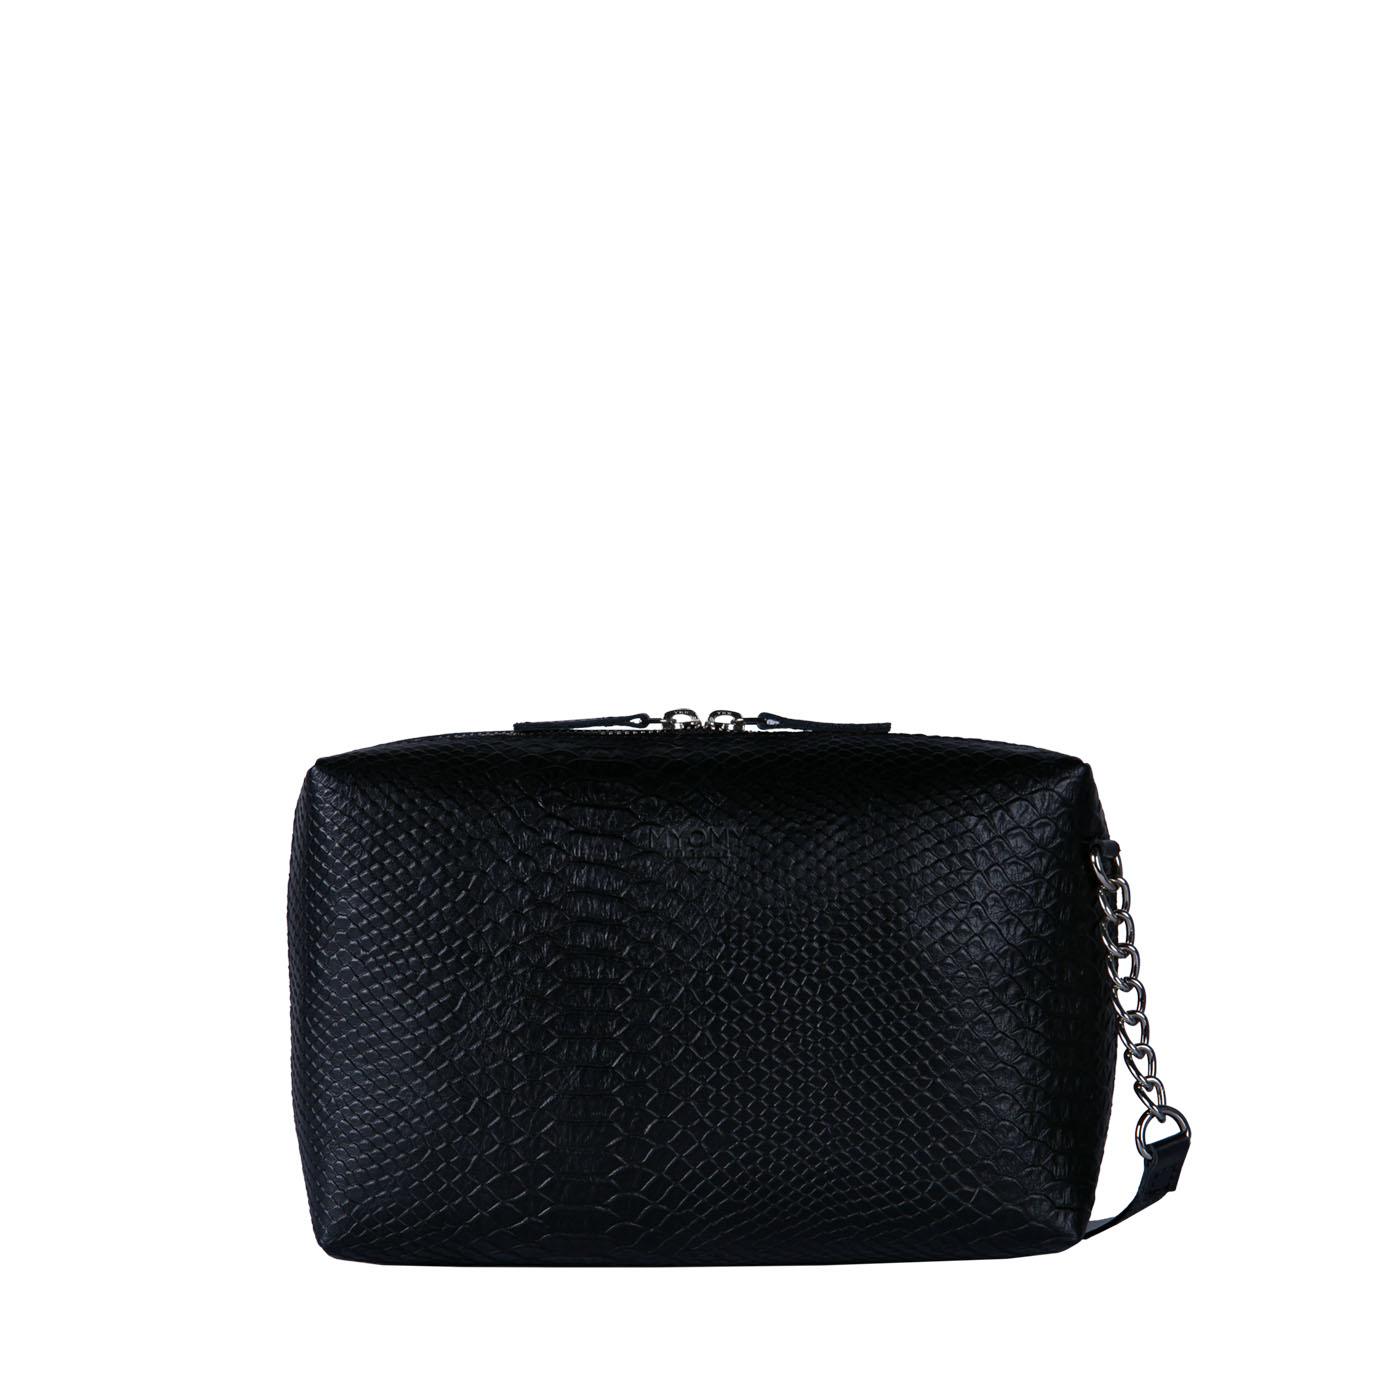 MY BOXY BAG Handbag - mix anaconda & hunter waxy black